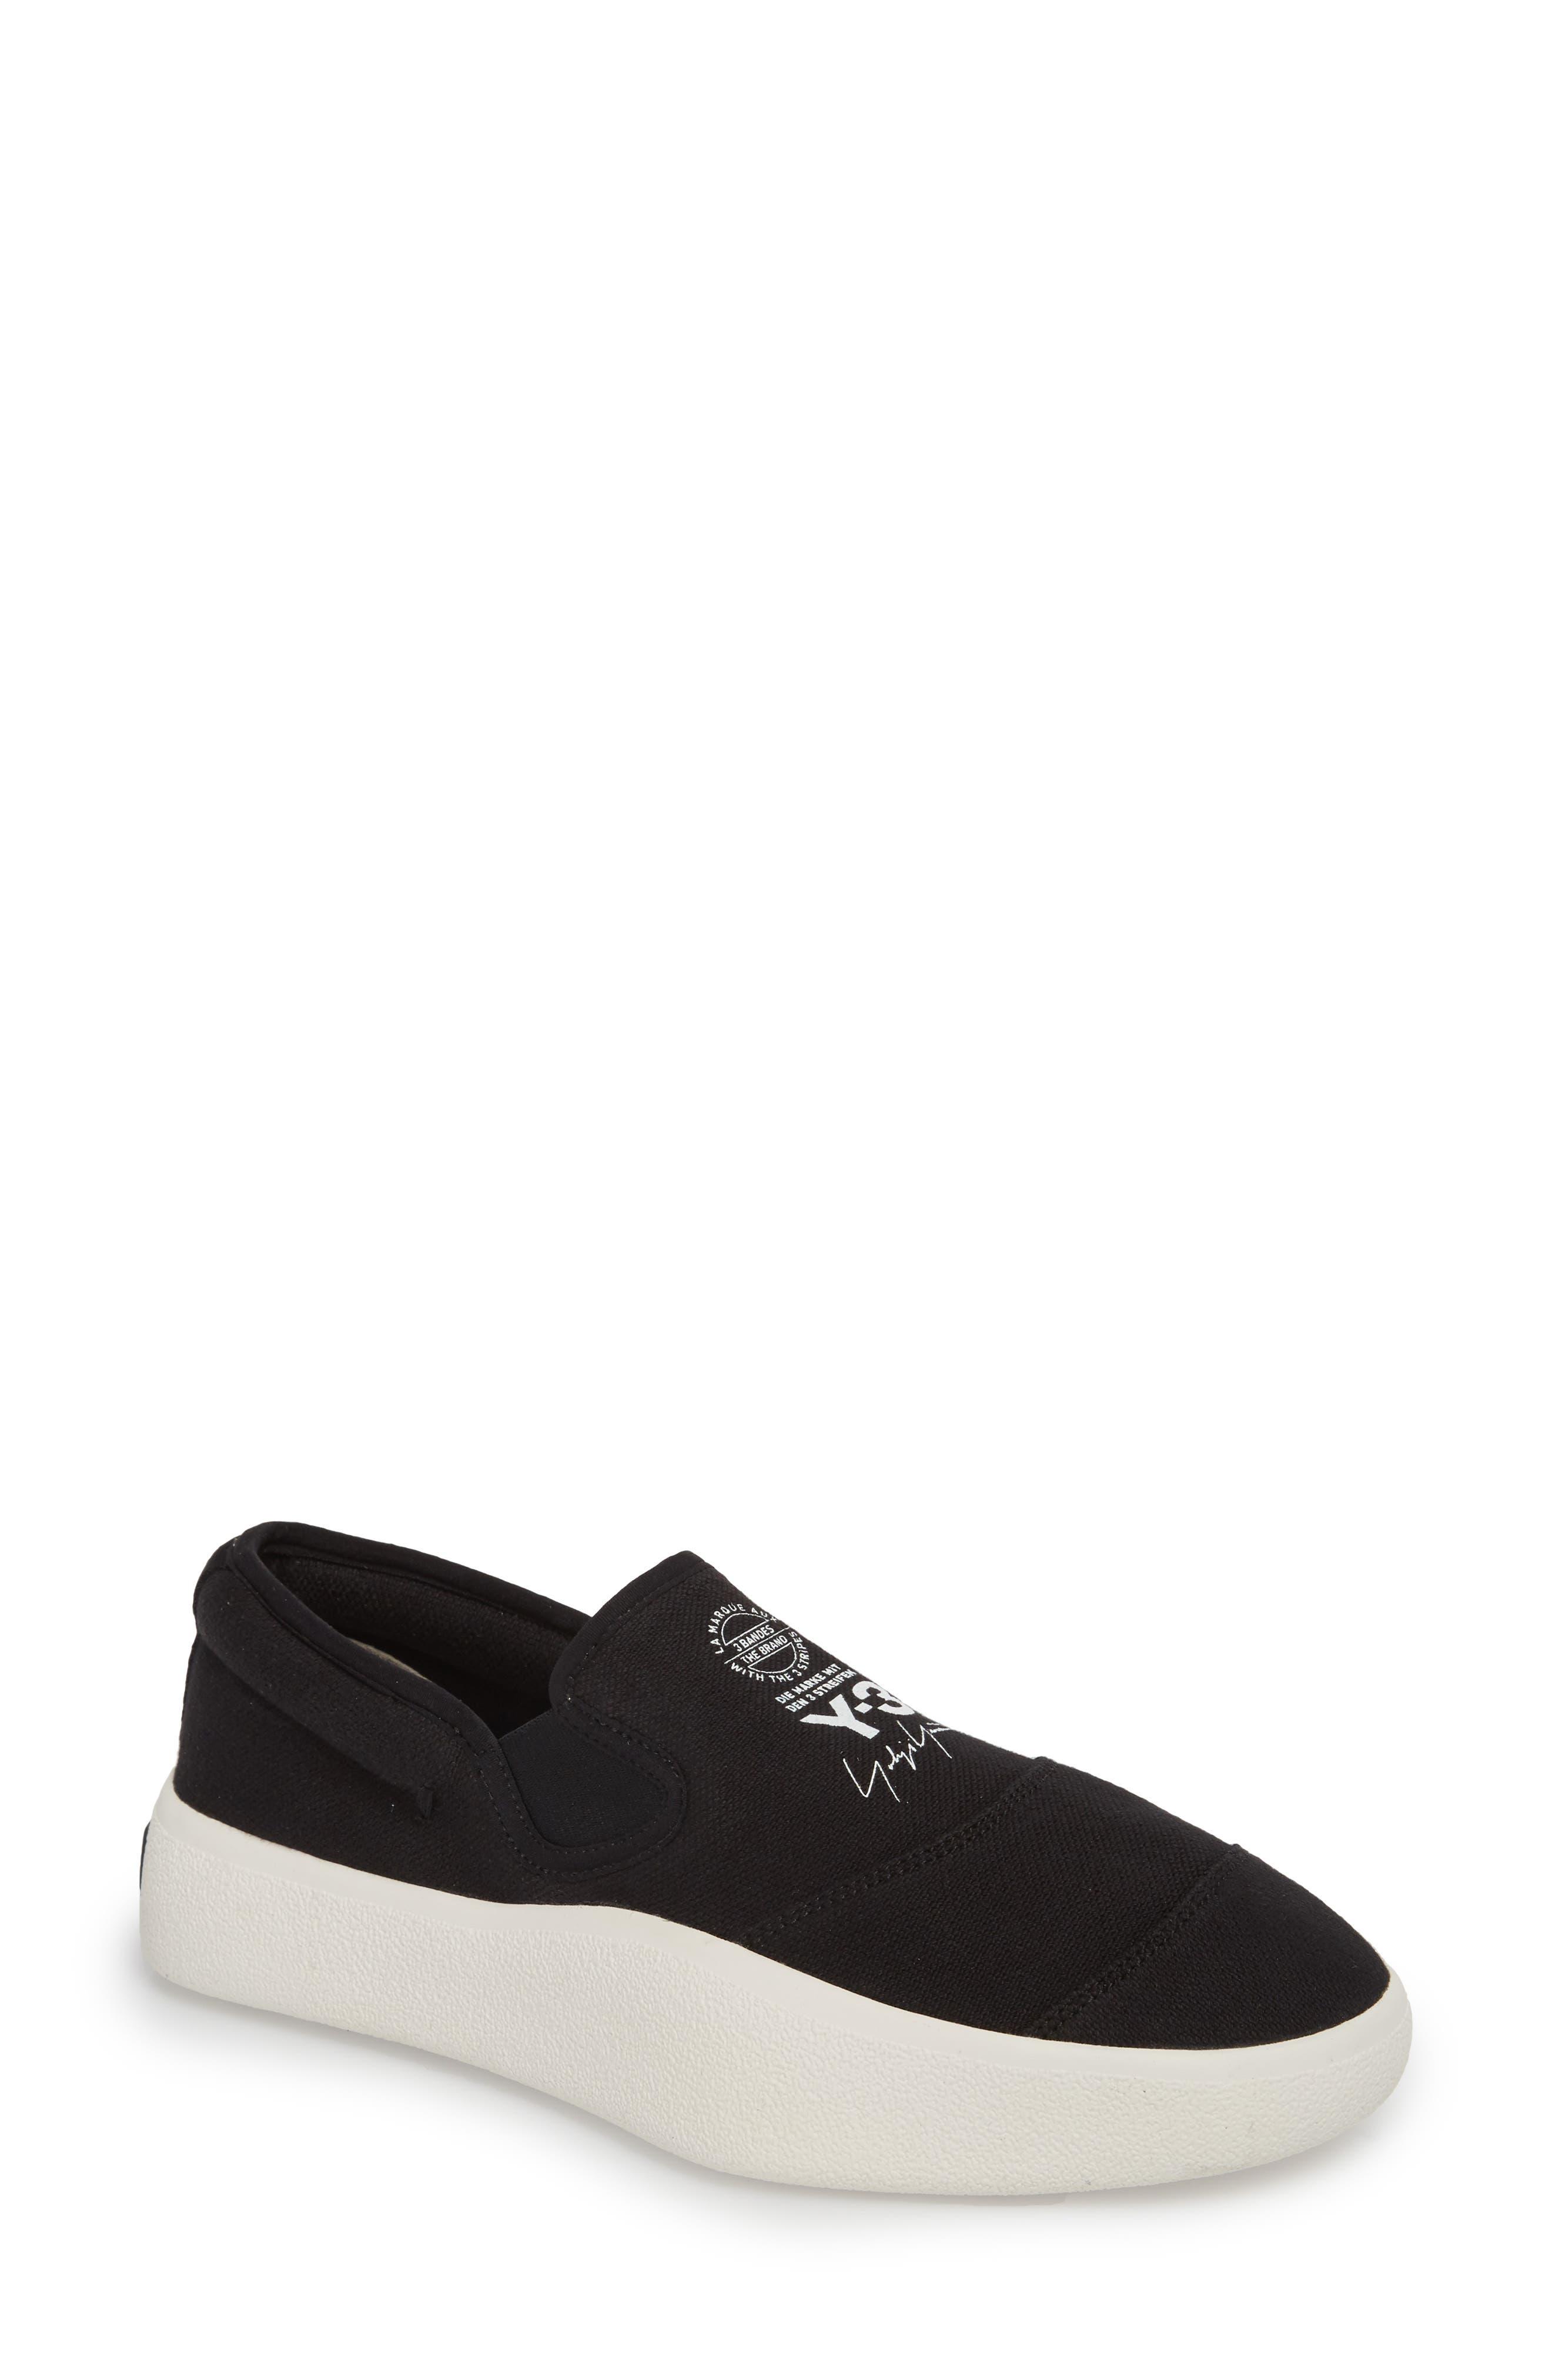 Tangutsu Slip-On Sneaker,                         Main,                         color, 001